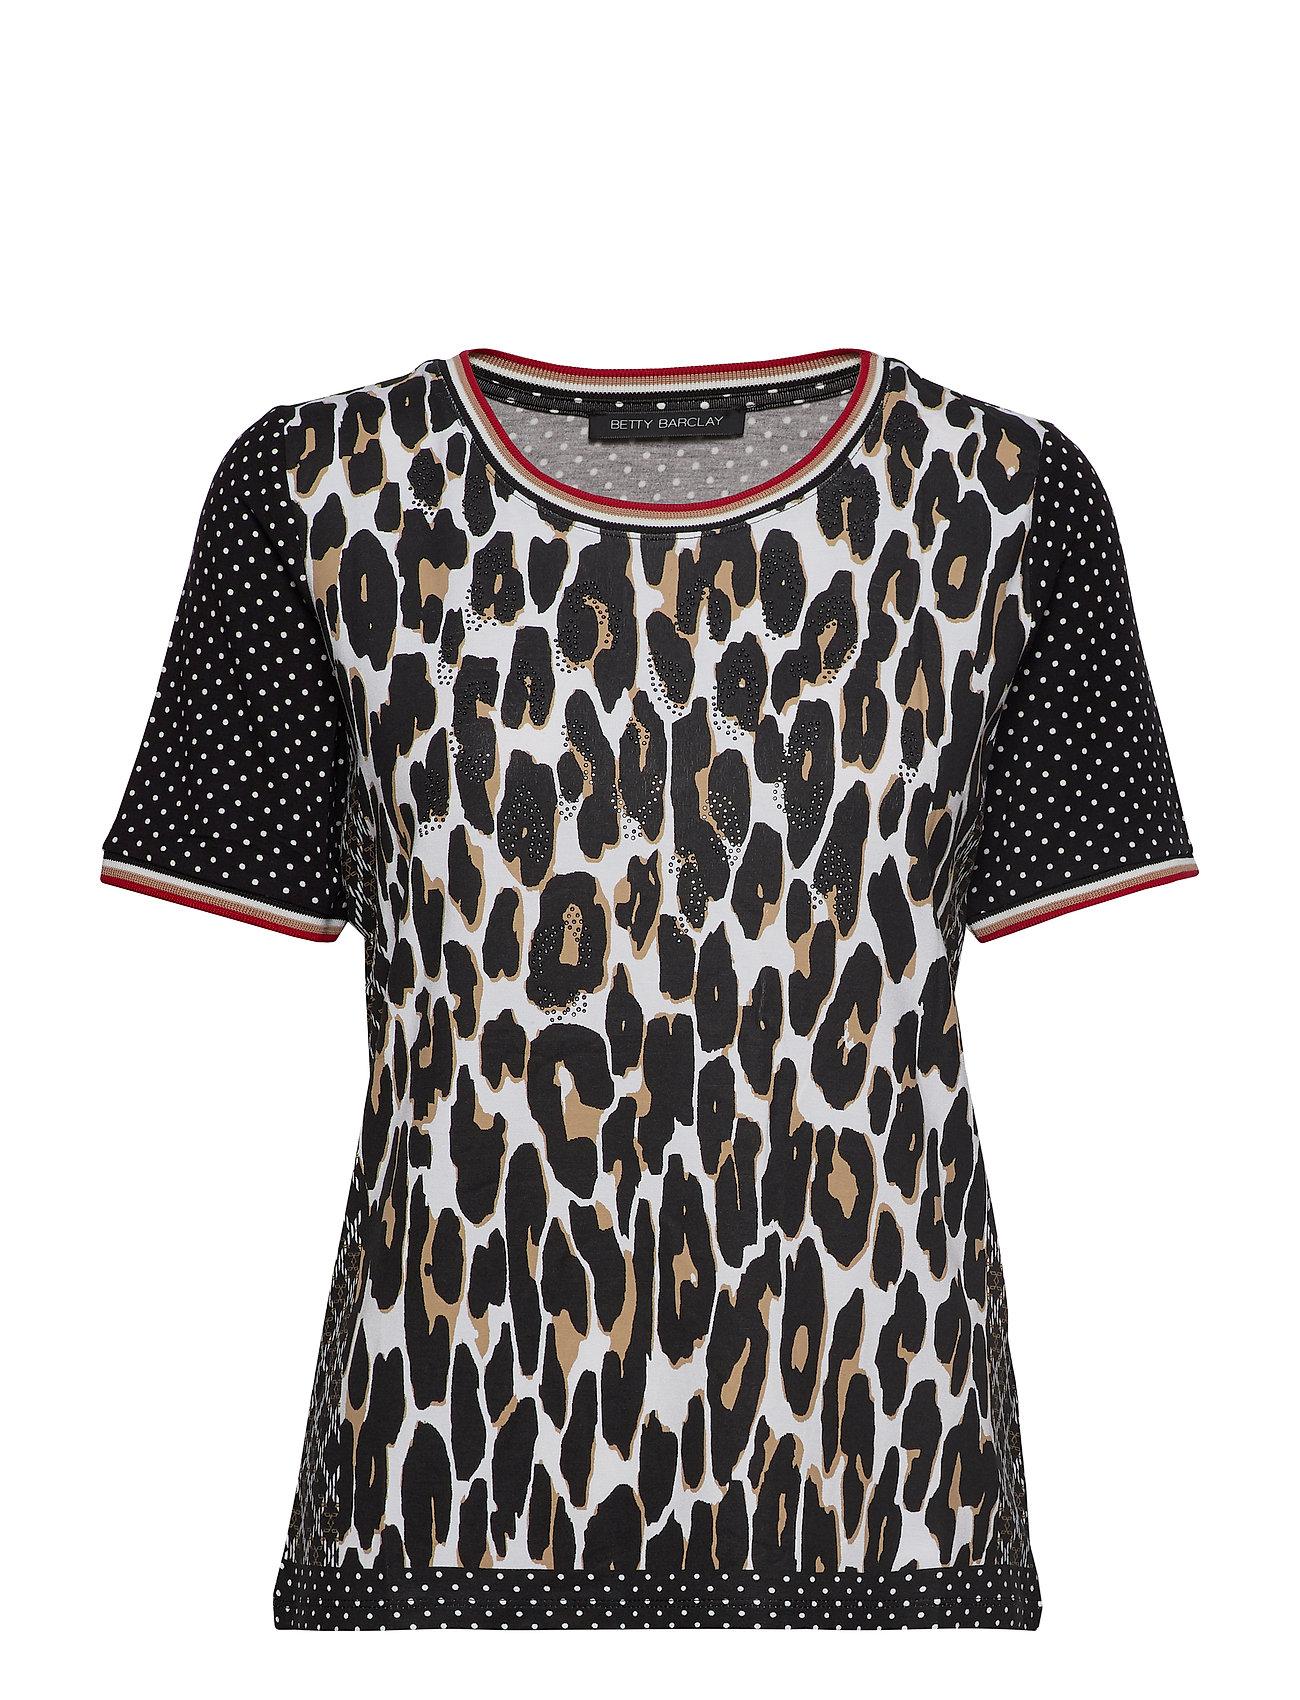 Betty Barclay Shirt Short 1/2 Sleeve - BLACK/CAMEL